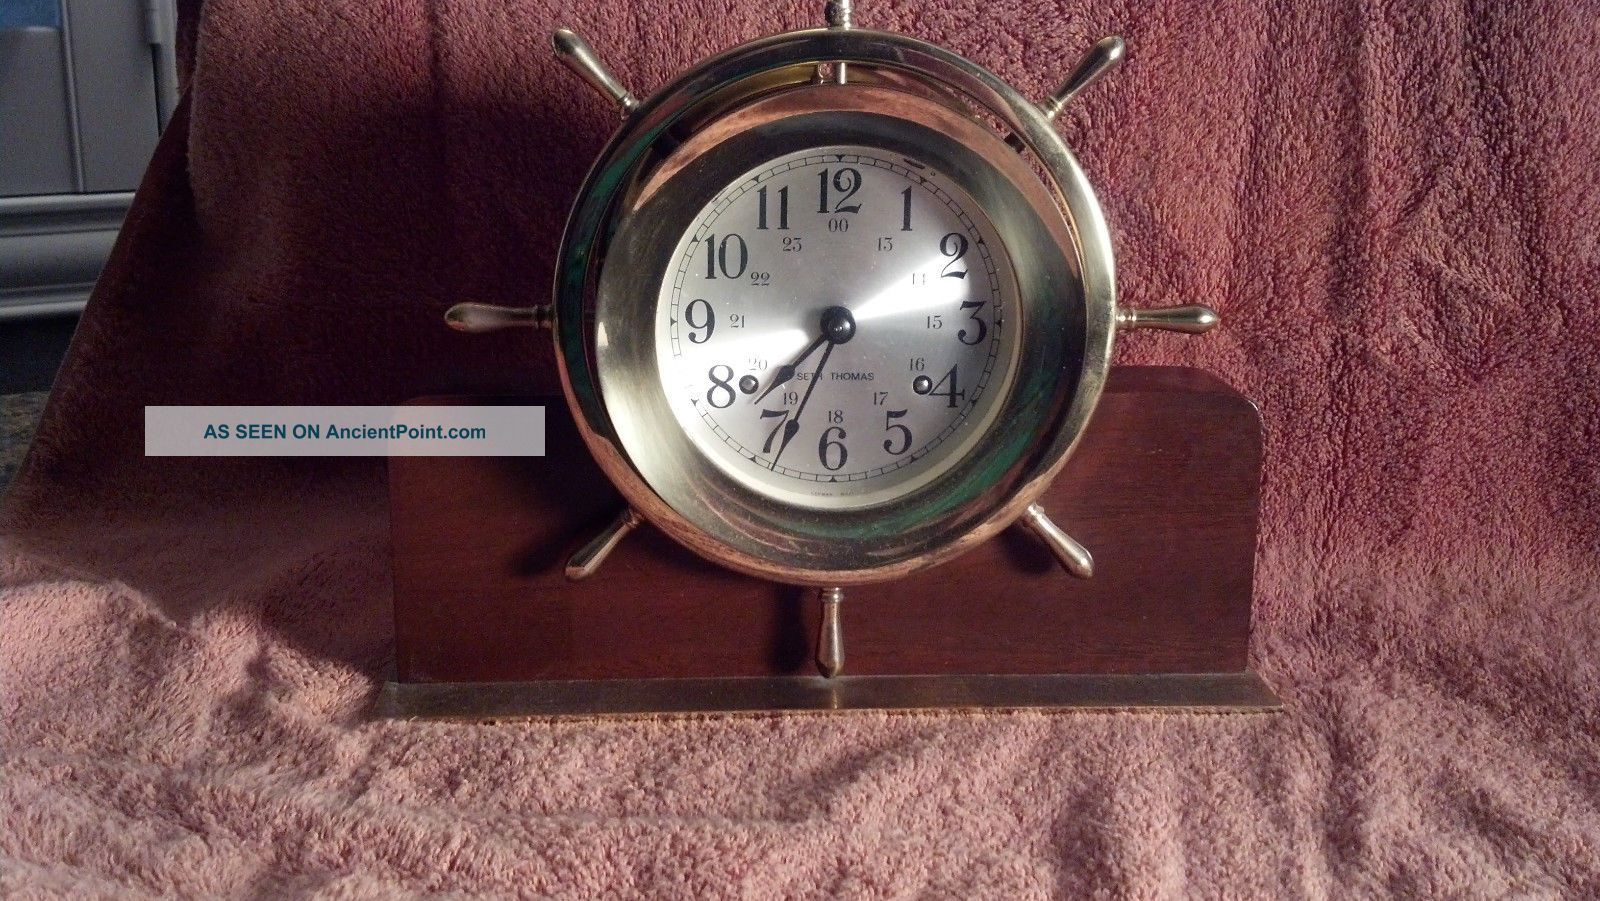 Seth Thomas Helmsman Brass Clock - But In Physical Clocks photo